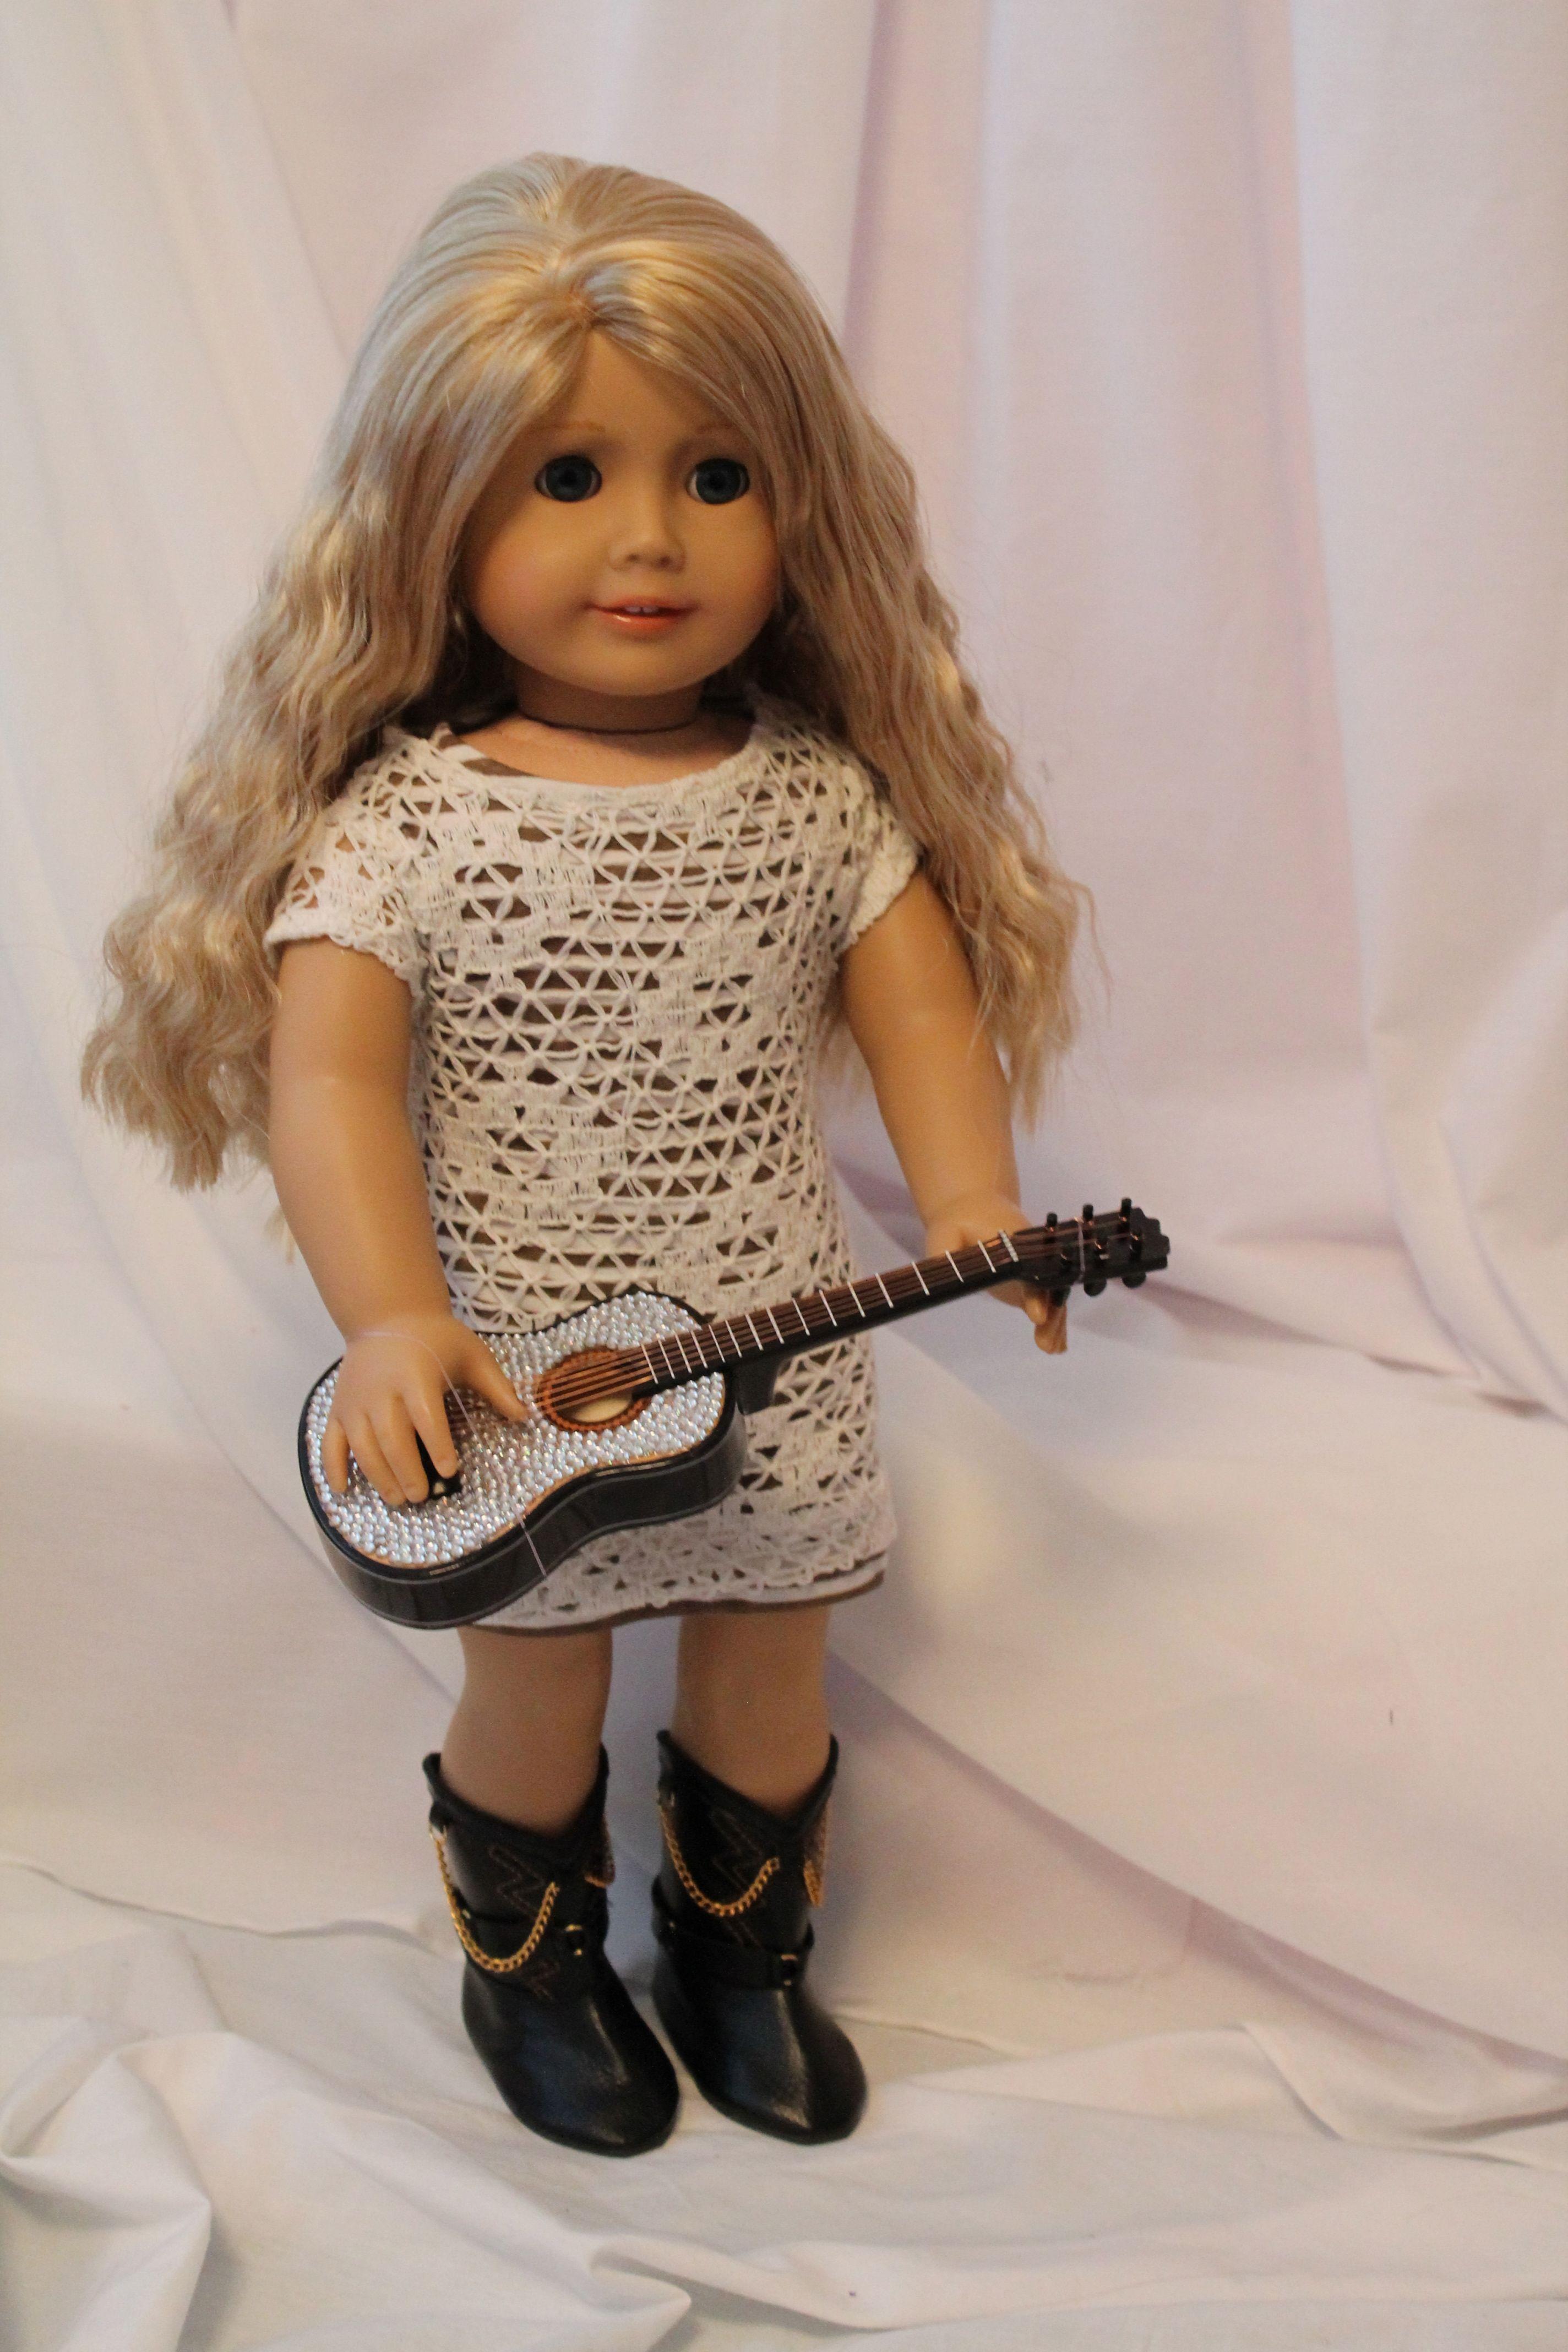 American Girl Custom Taylor Swift by Terrie | American Girl Dolls ...